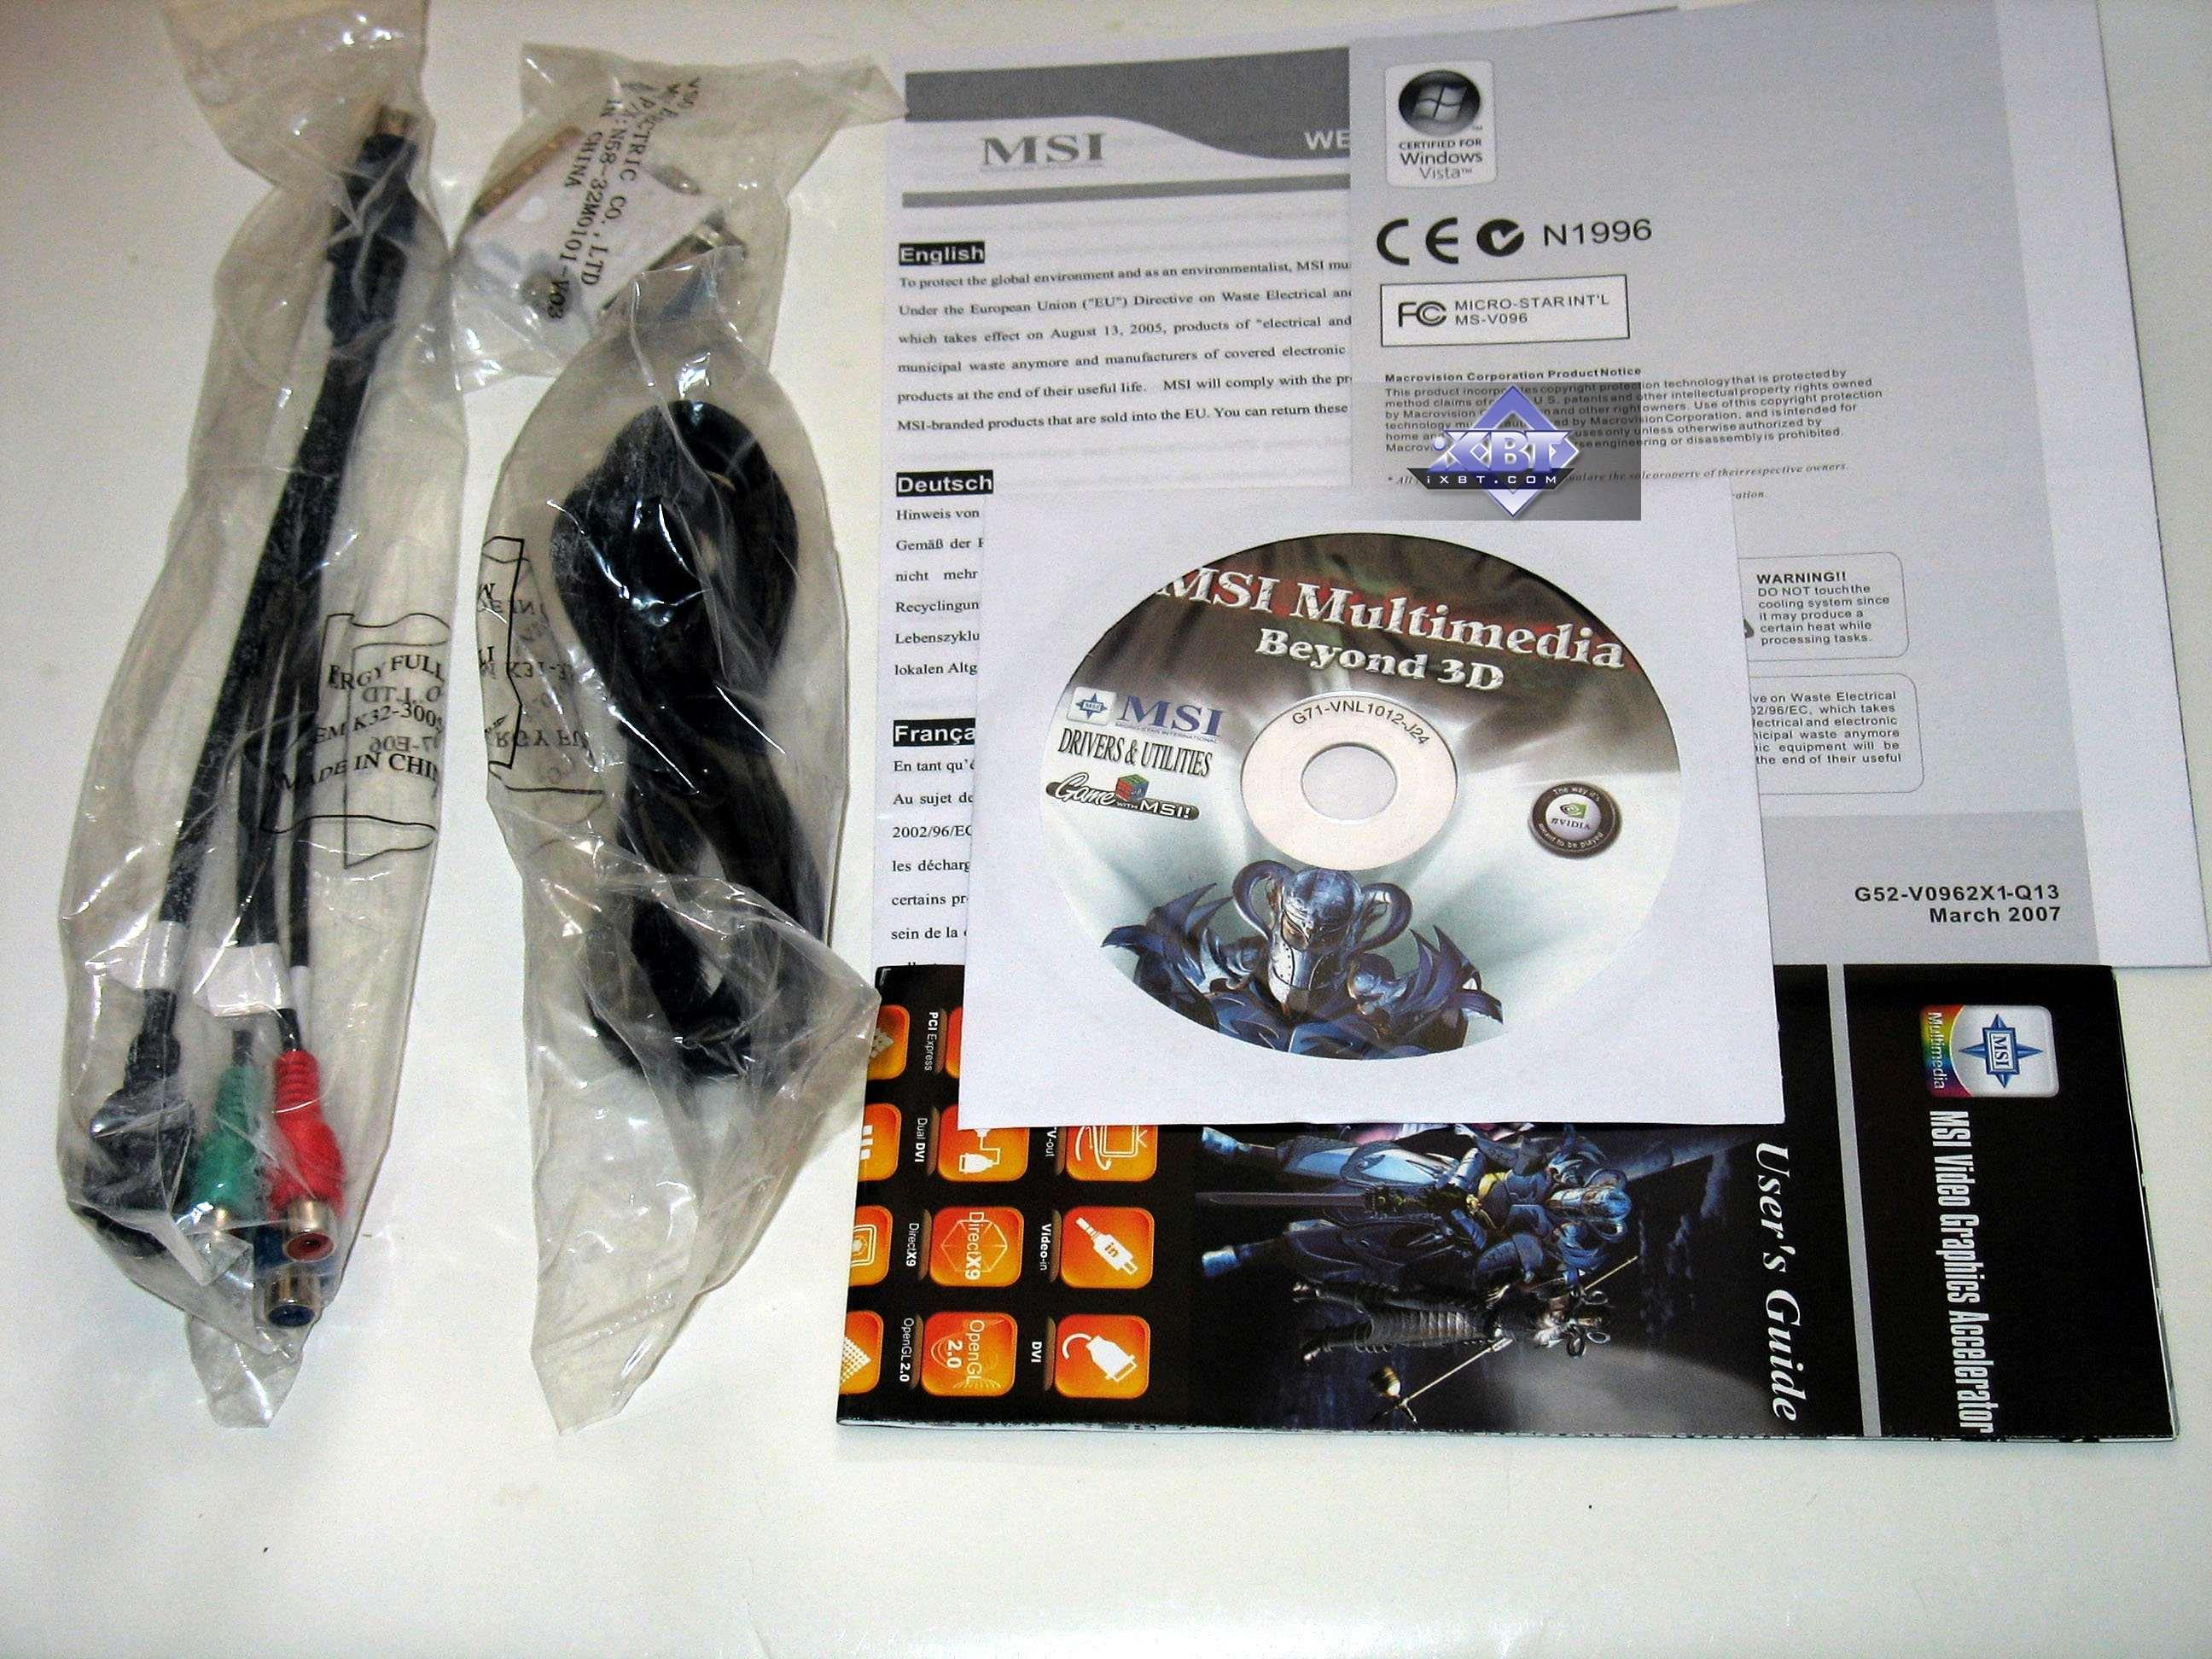 Geforce 8600 Gts Drivers